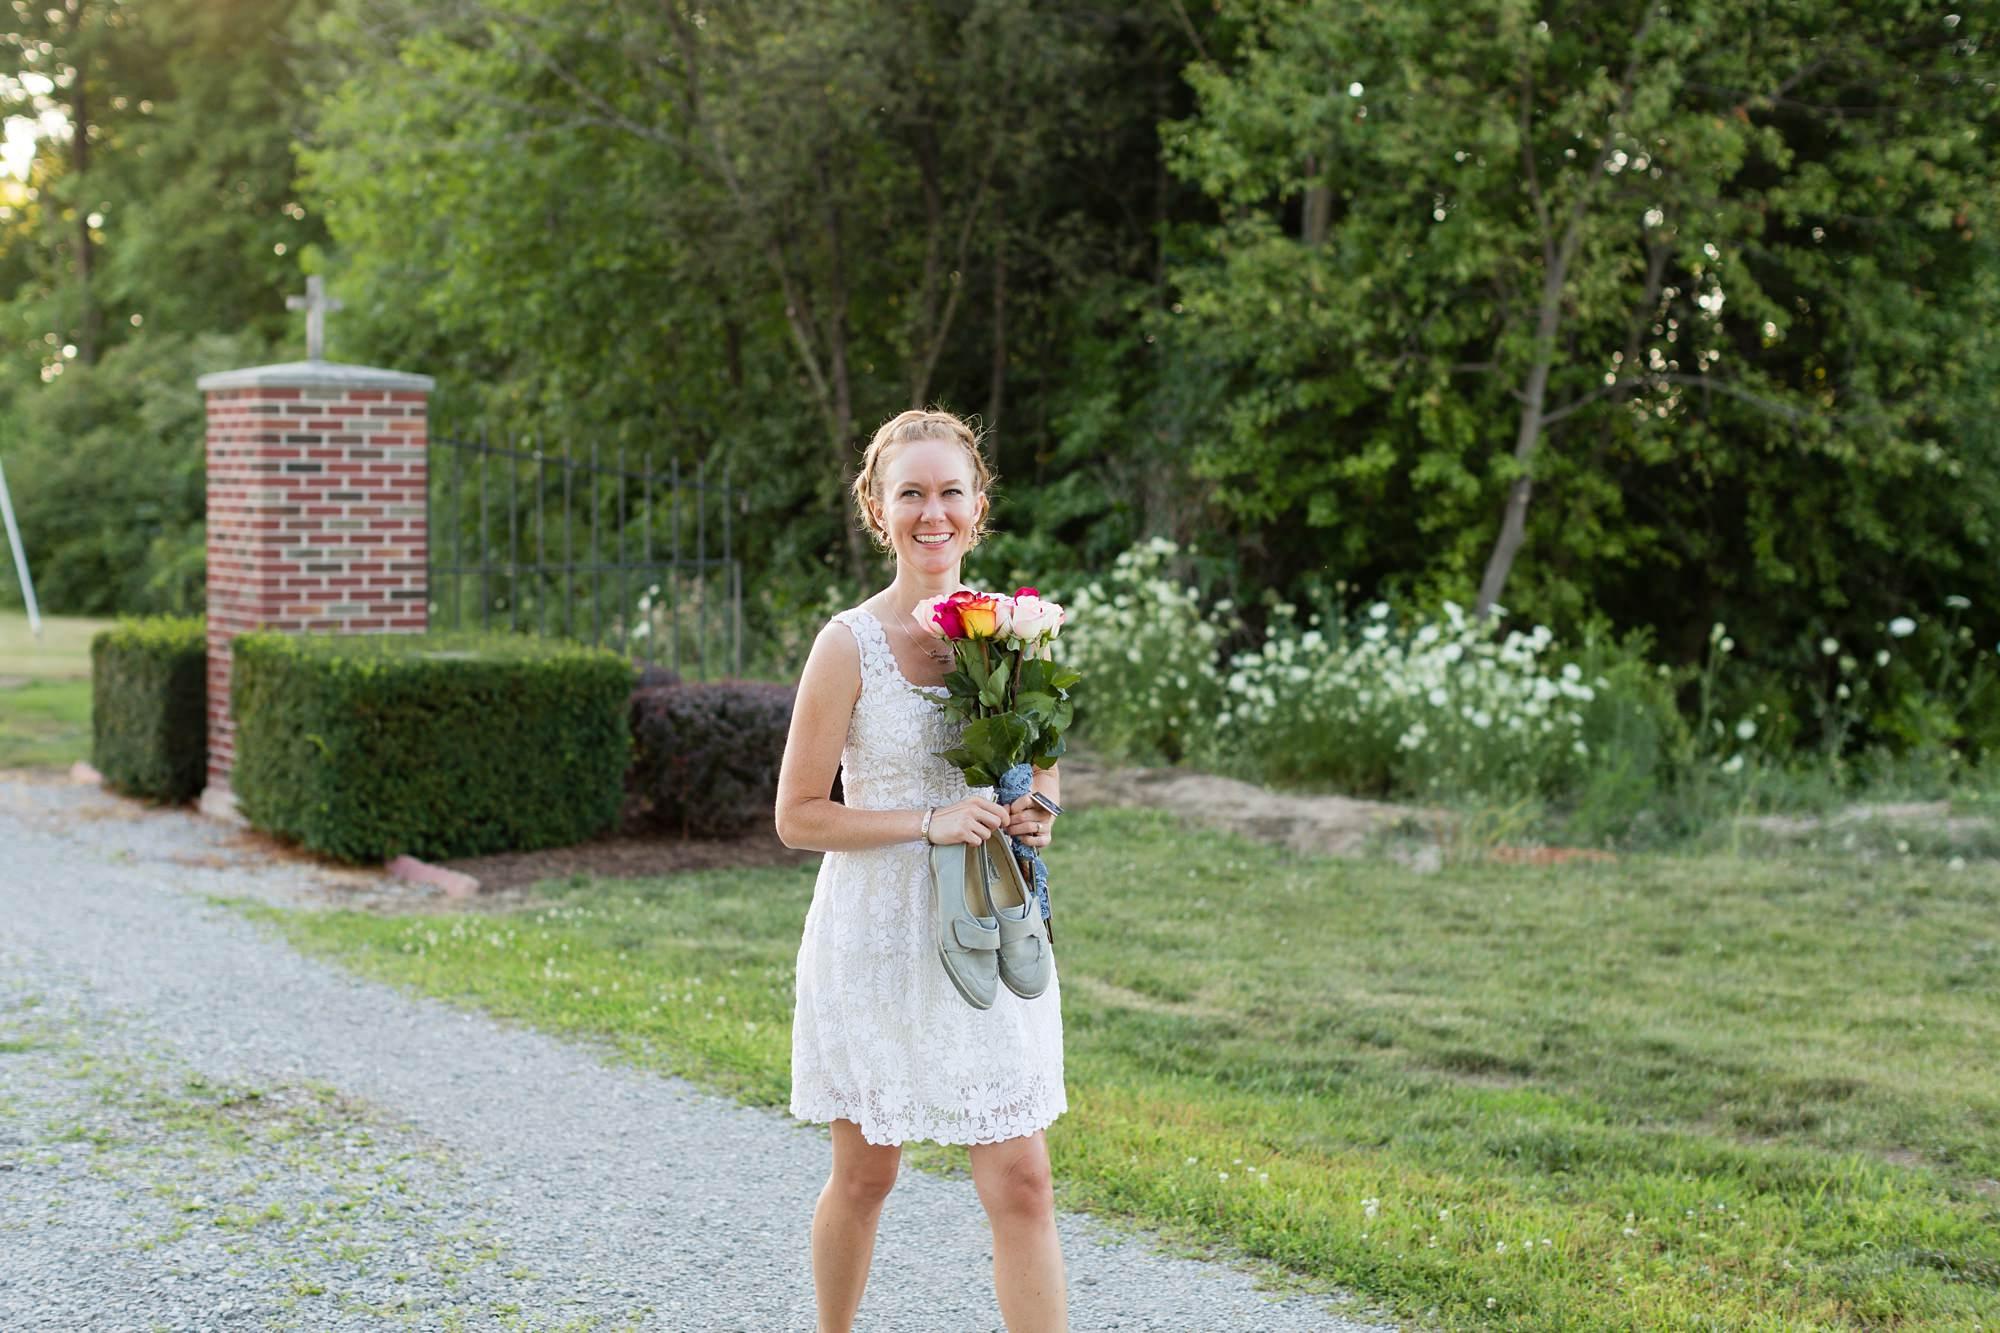 Bride walks up aisle at intimate graveyard wedding